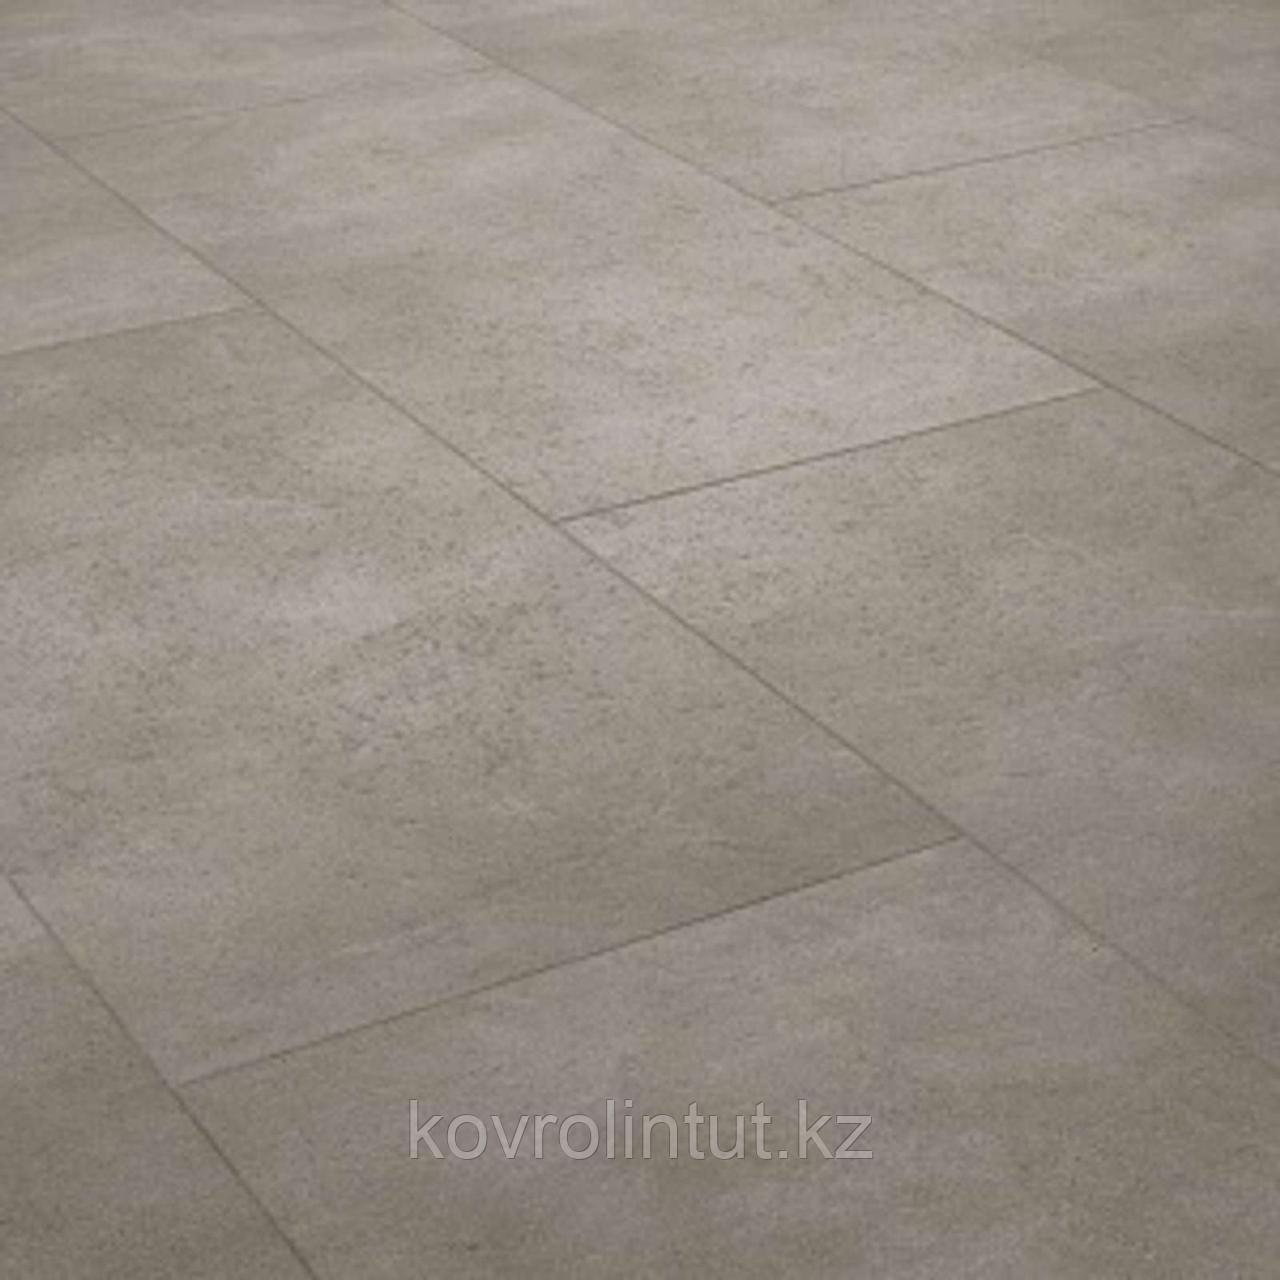 Плитка ПВХ замковая Arbiton Amaron Baker Concrete CA151